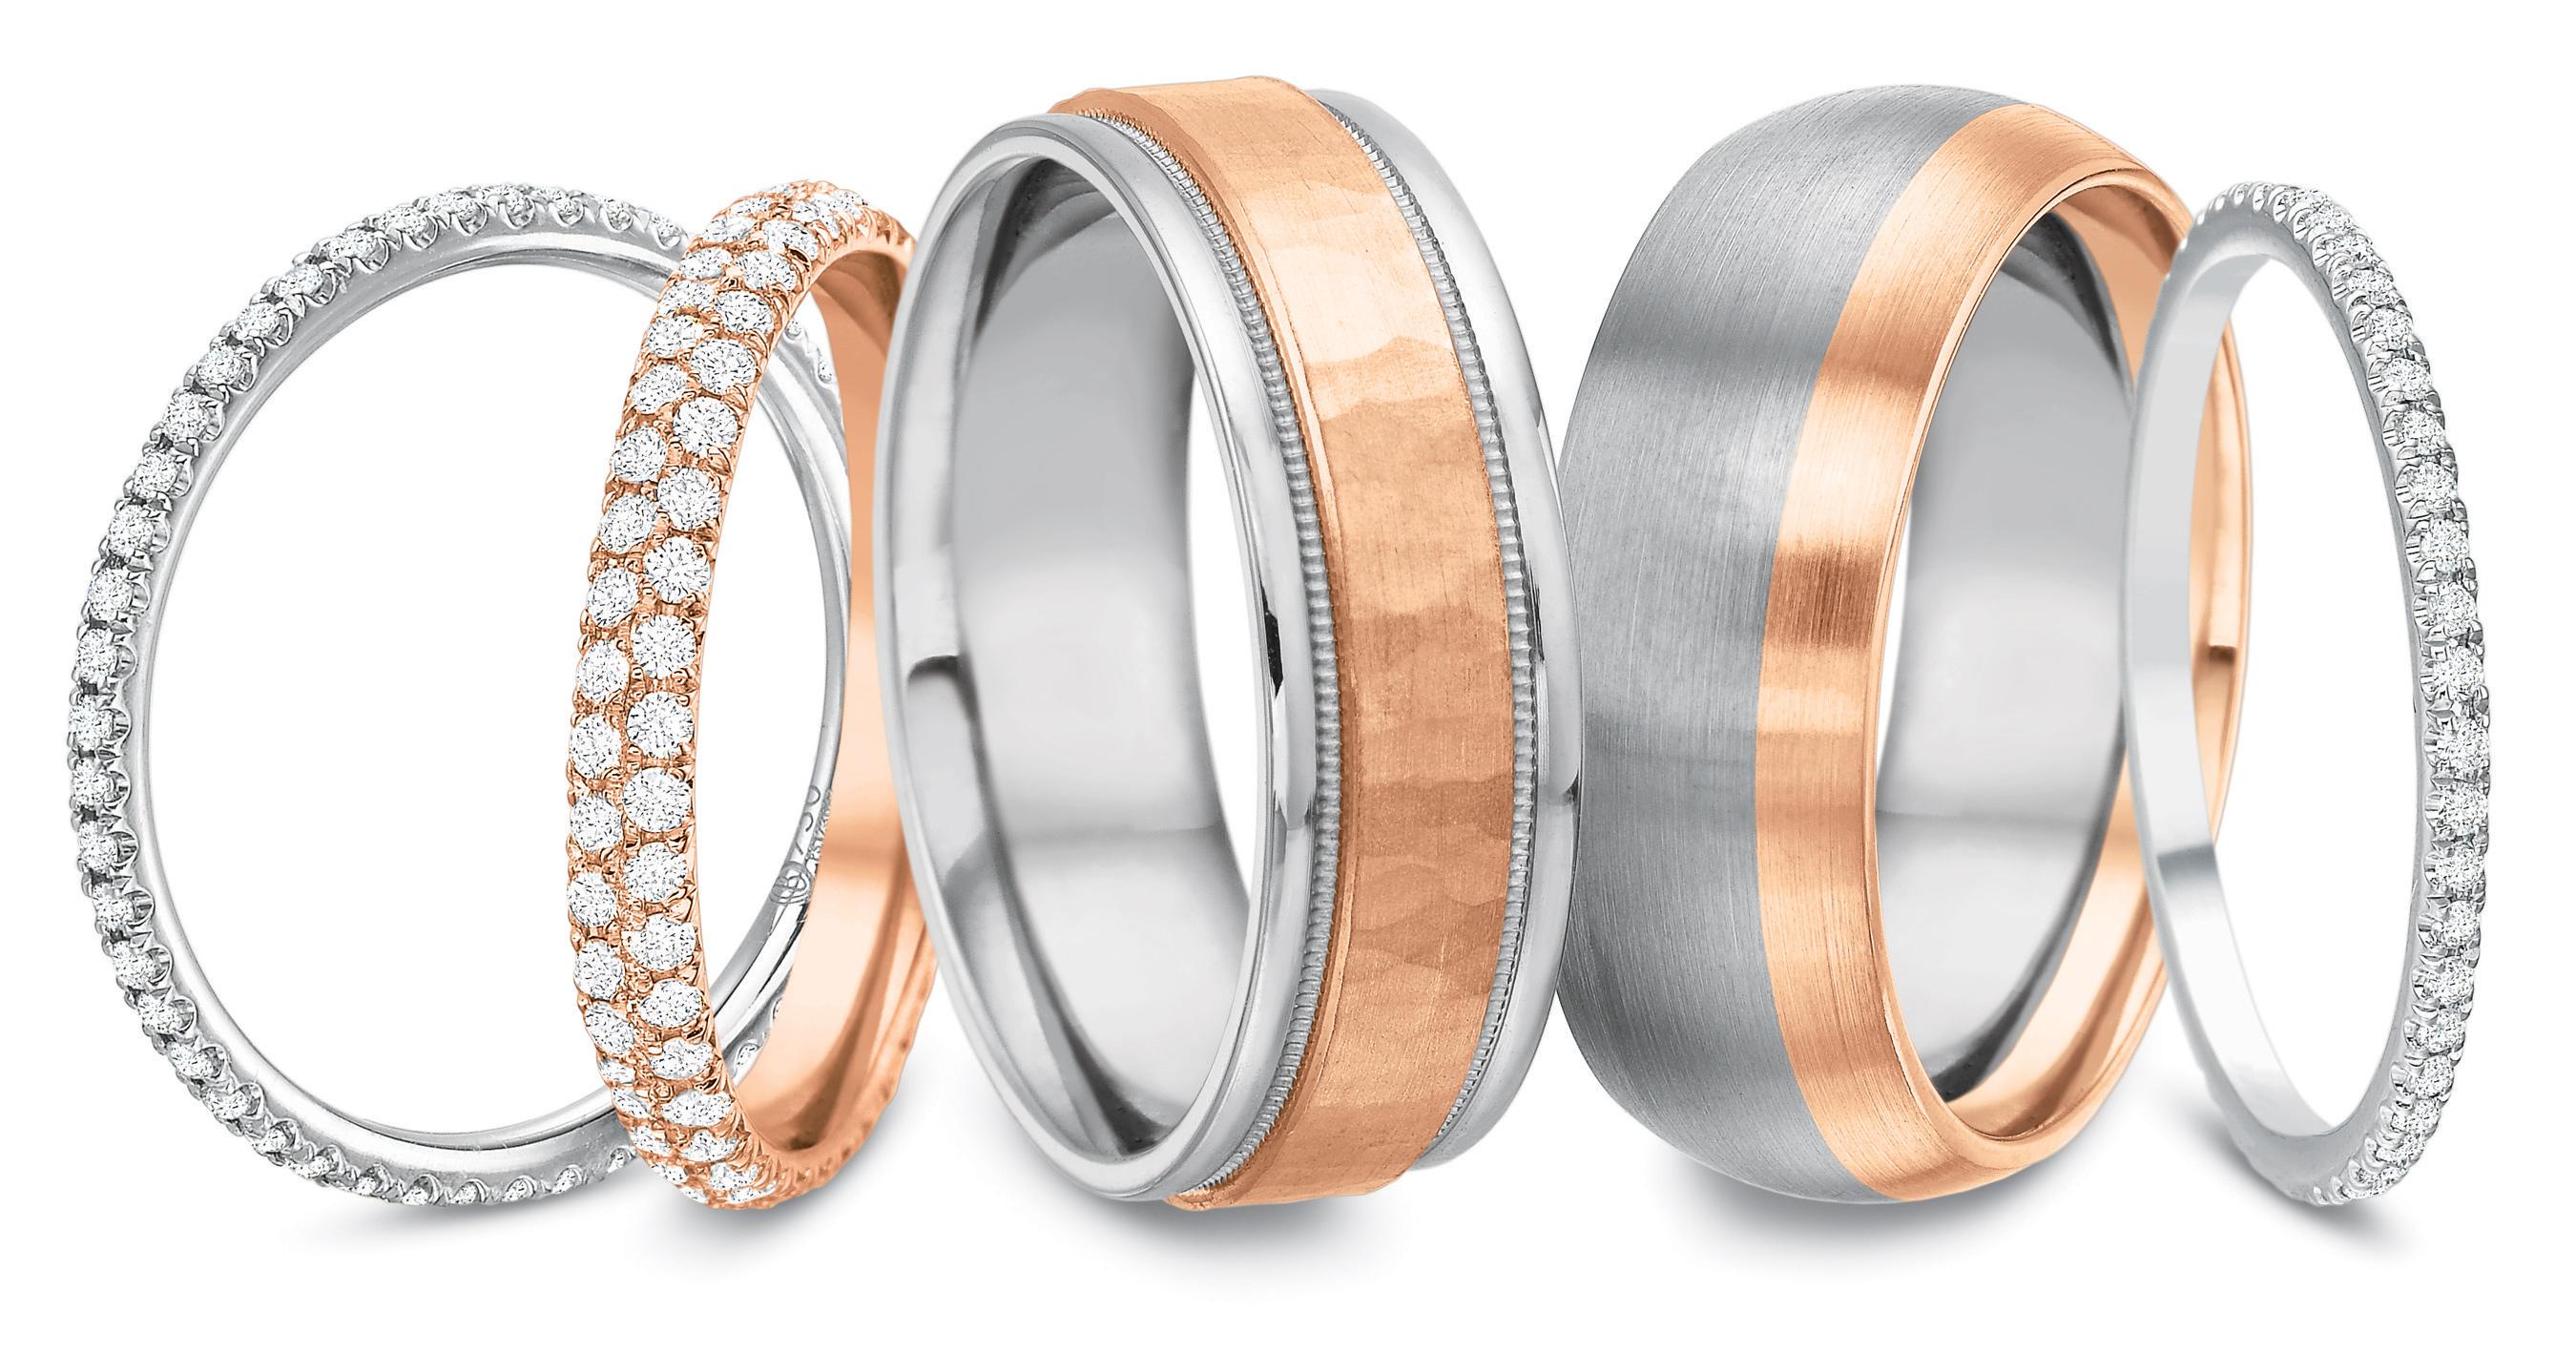 Lewis Jewelers Jewelry Weddings in Houston